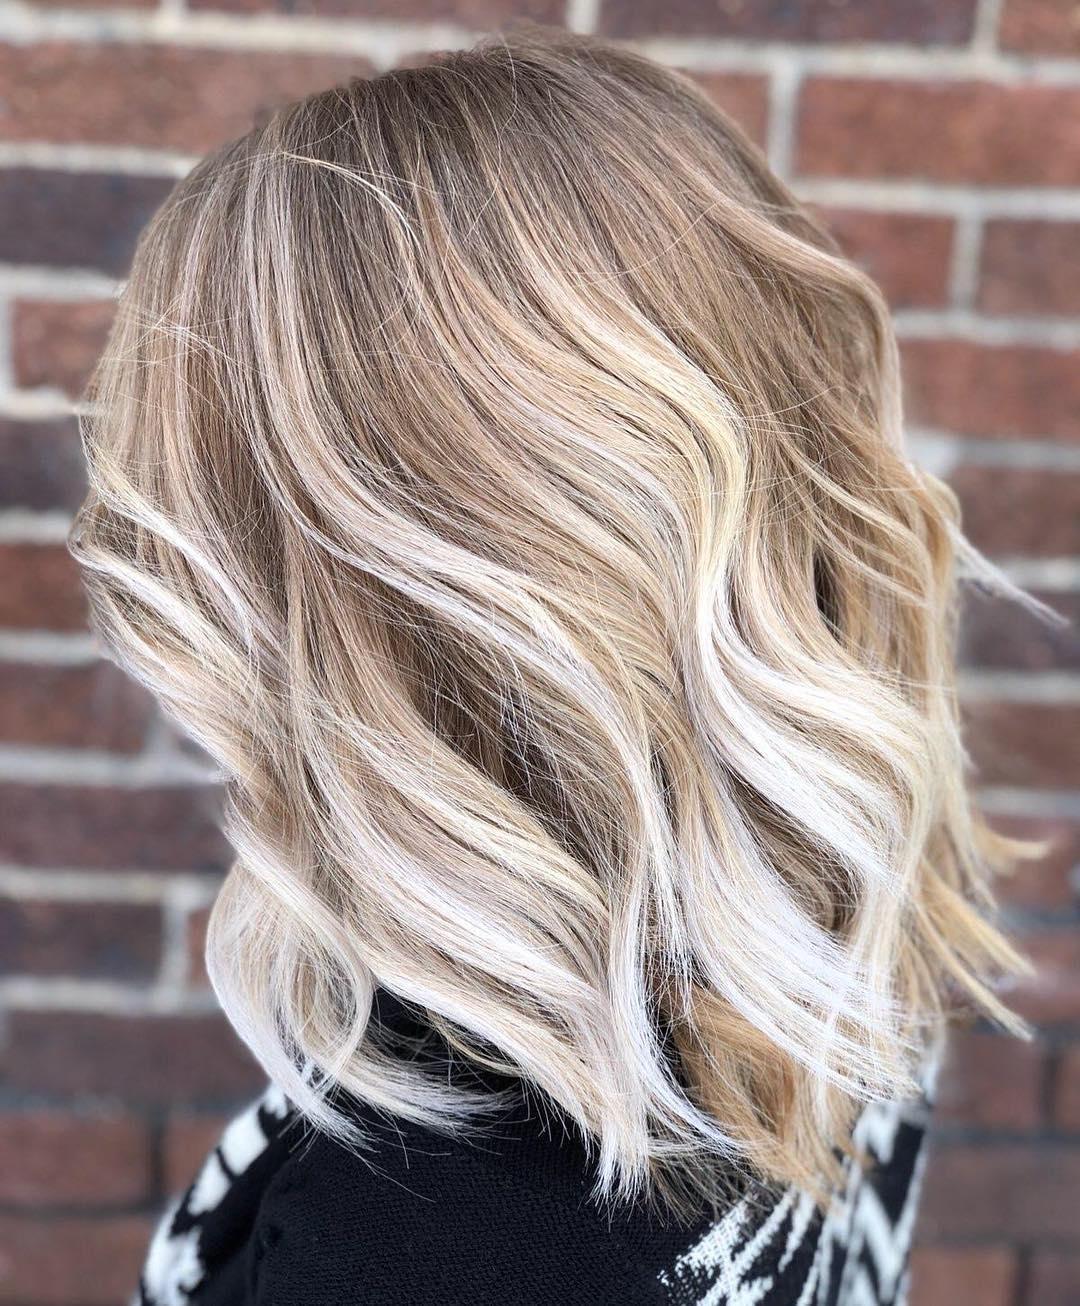 medium hairstyle with balayage